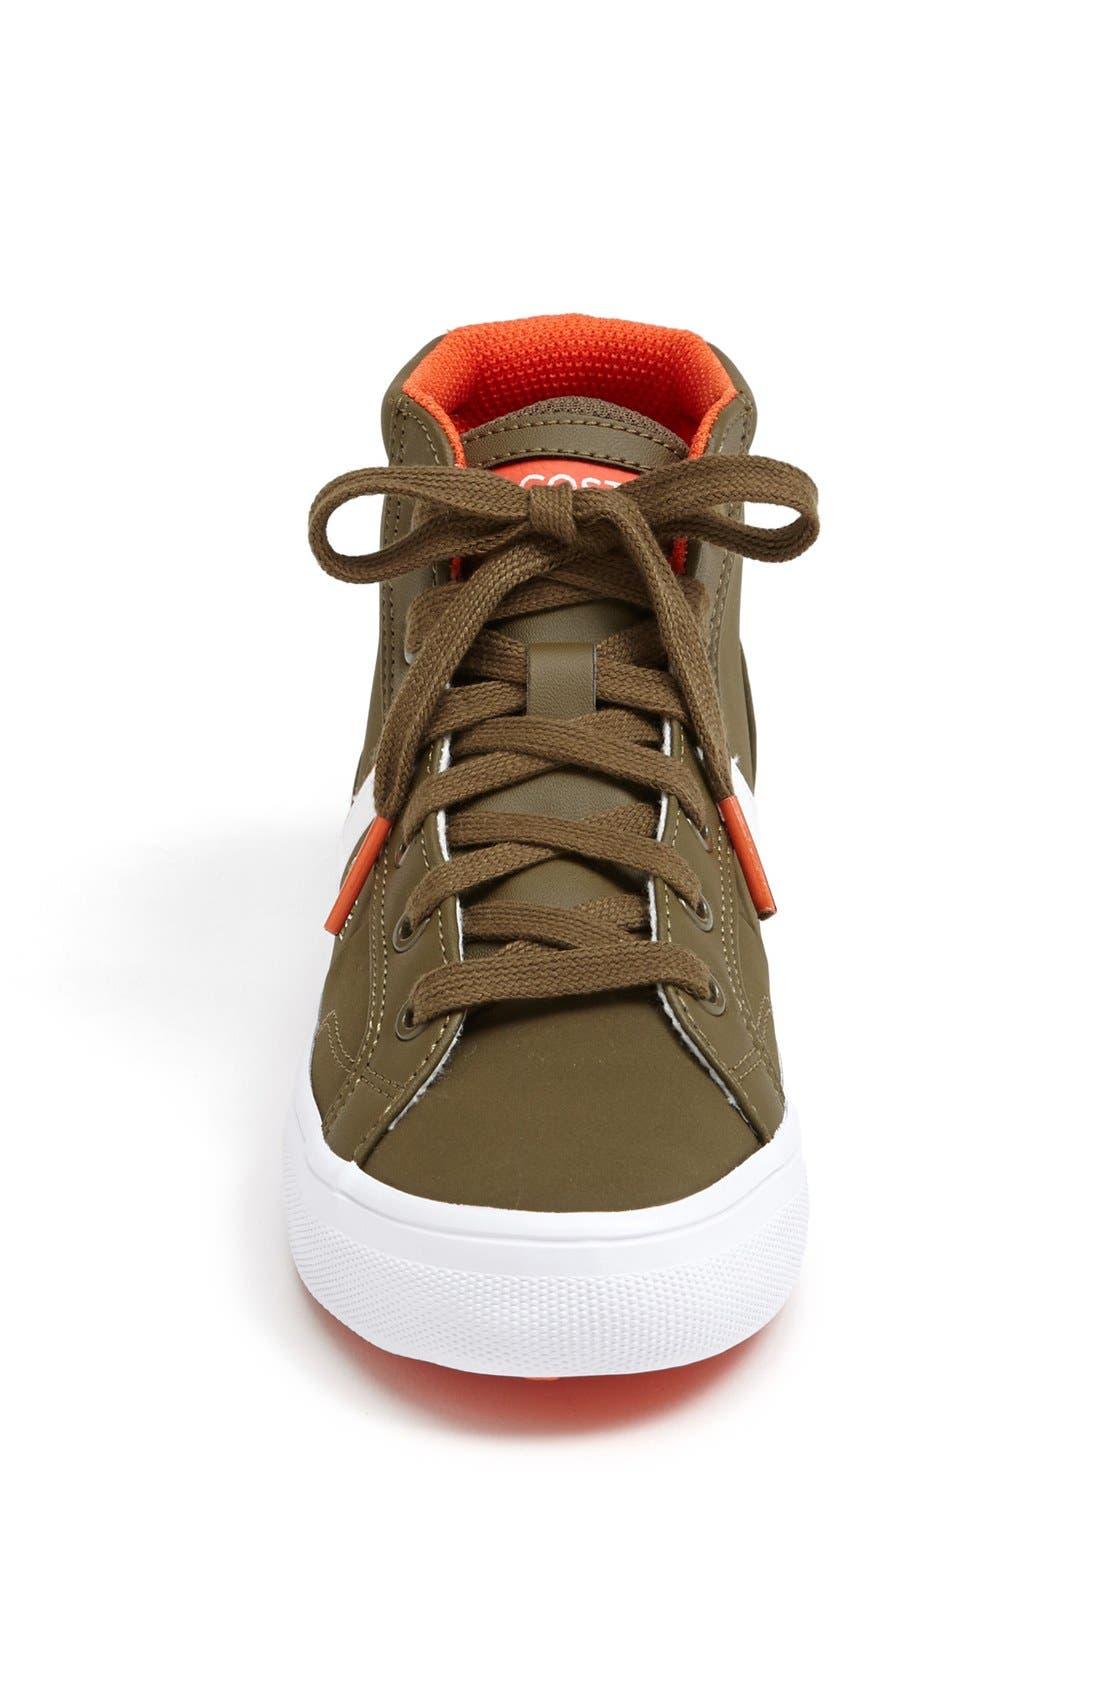 Alternate Image 3  - Lacoste 'Fairlead' High Top Sneaker (Toddler, Little Kid & Big Kid)